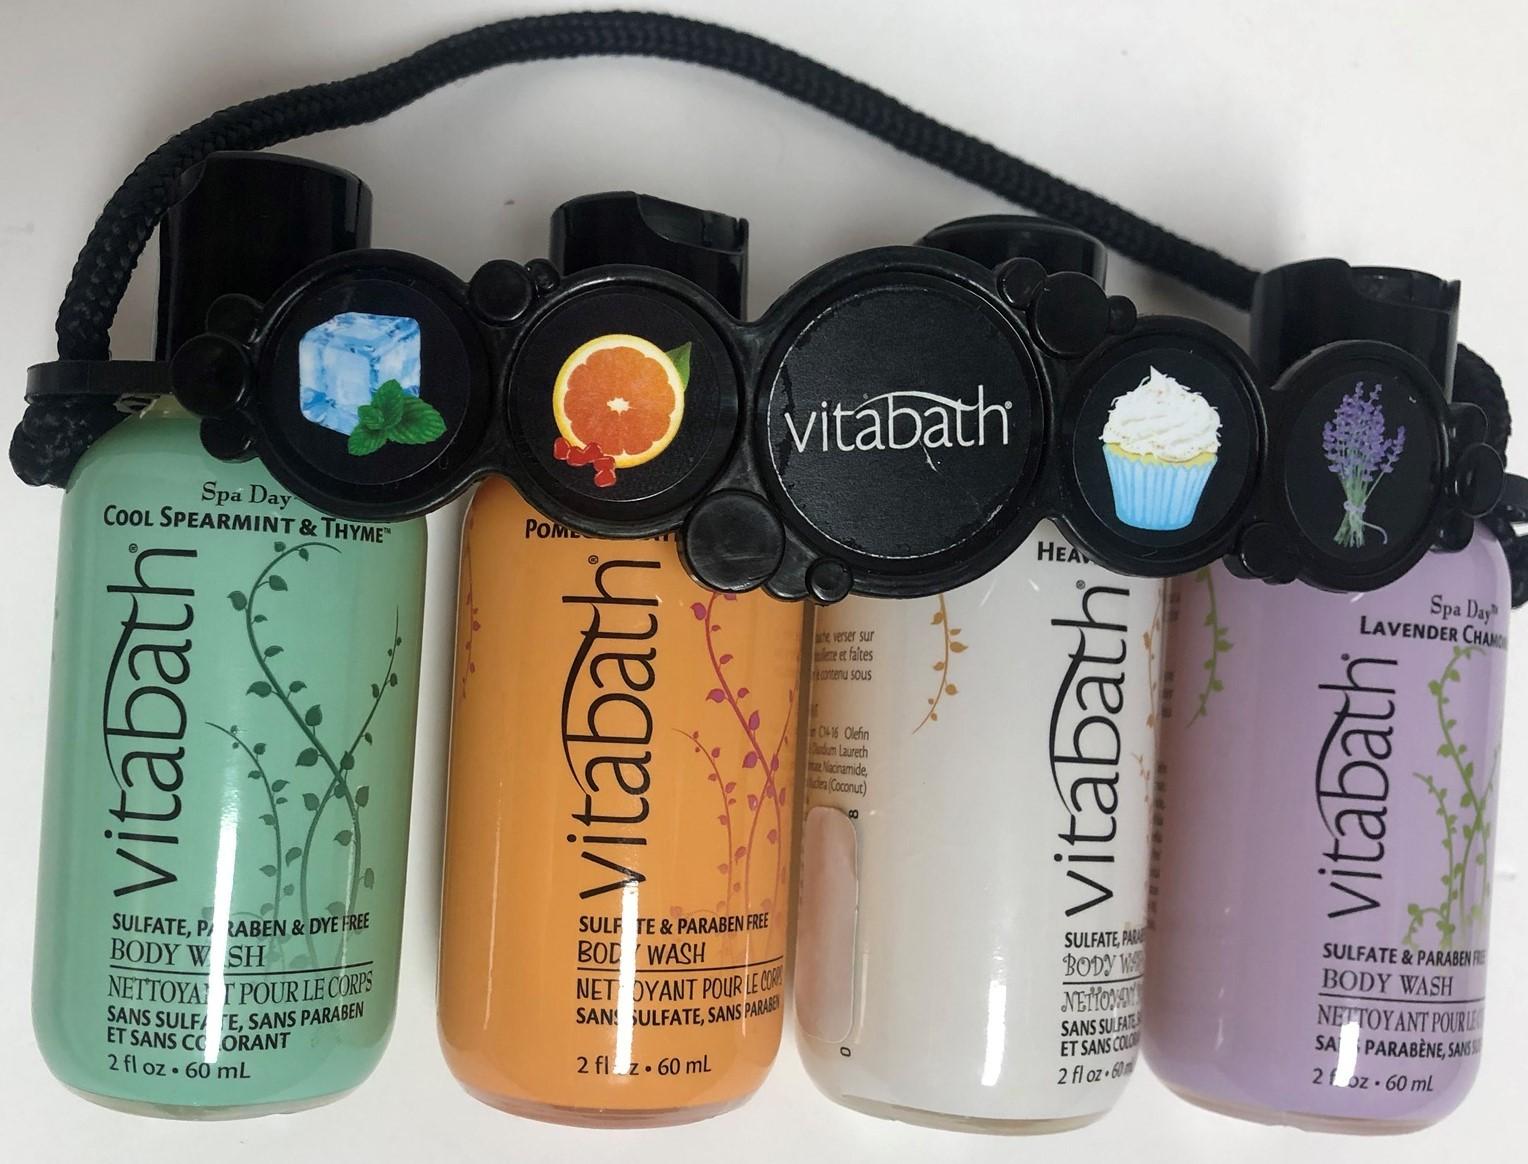 Vitabath Gift Set Body Wash 4-2 OZ Bottles Spearment Orange Coconut Lavender image 4